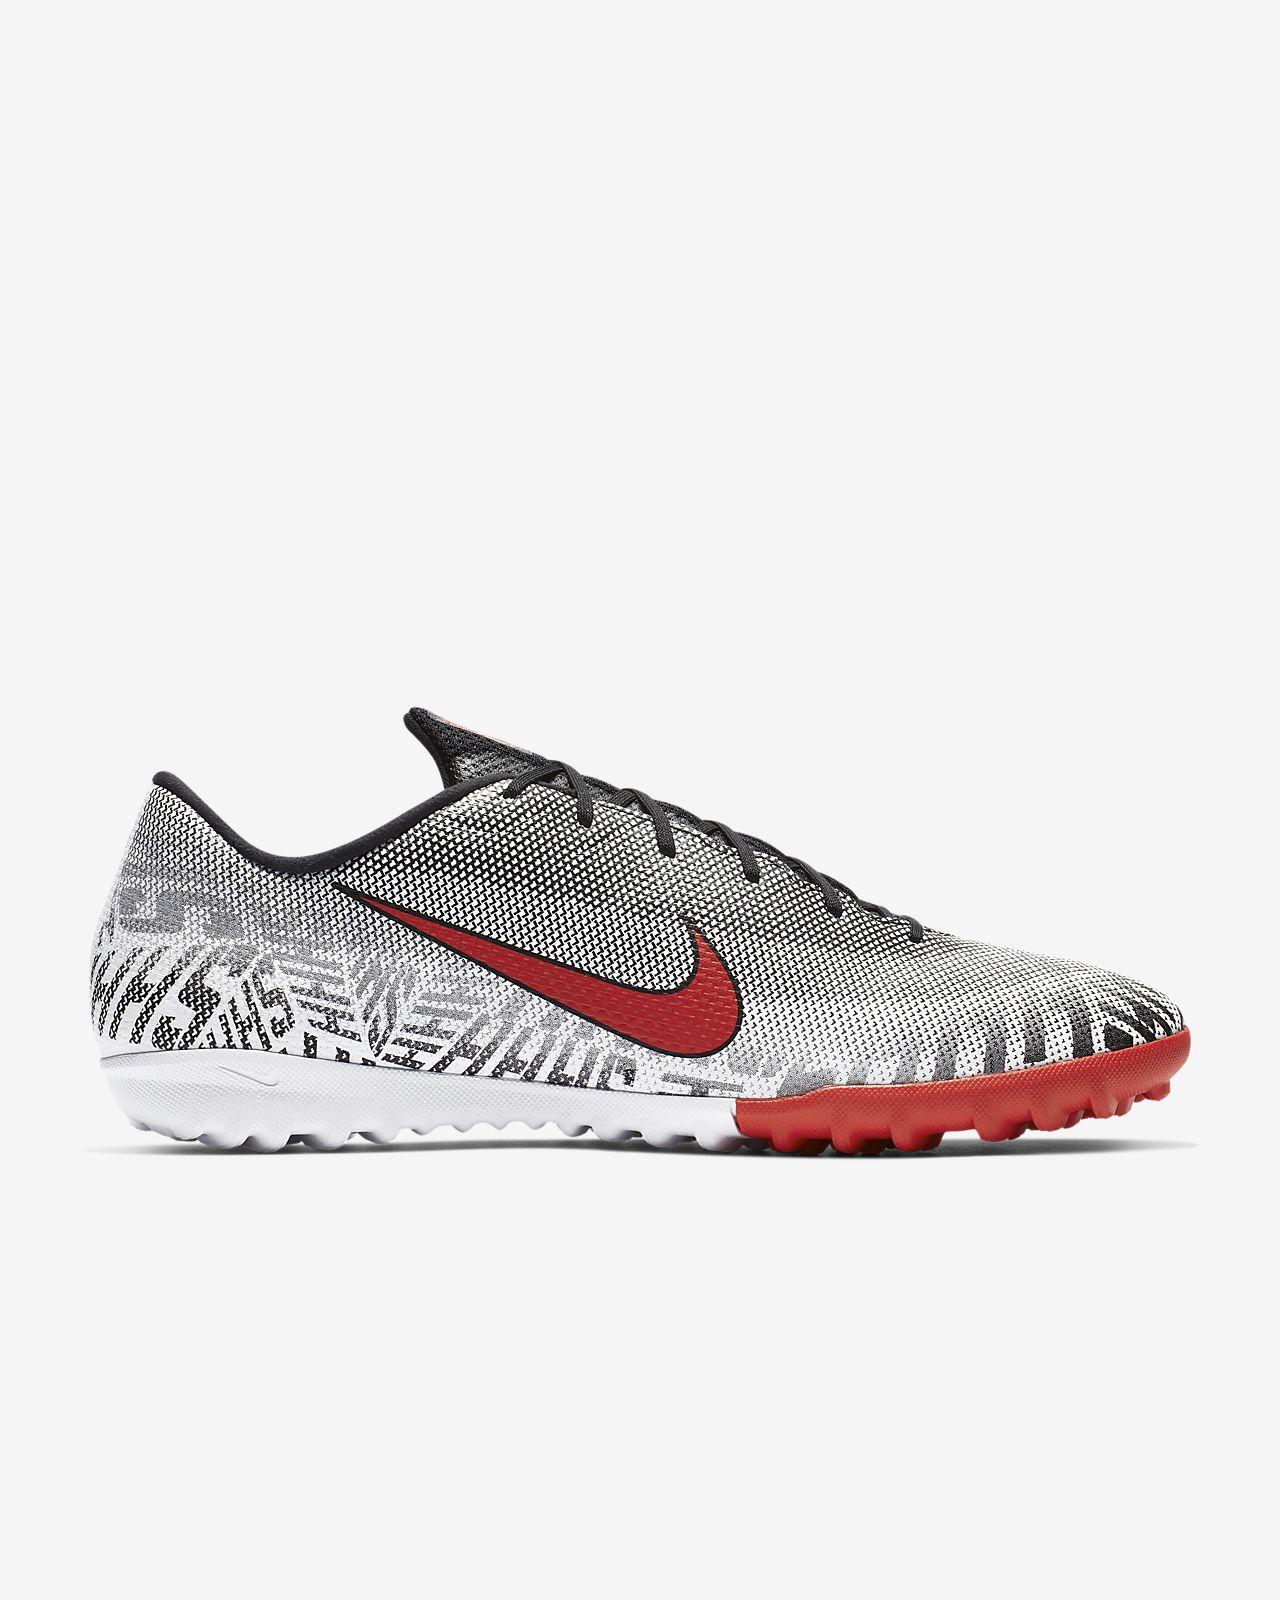 68fa6390e ... Nike Mercurial Vapor XII Academy Neymar TF Artificial-Turf Football Shoe